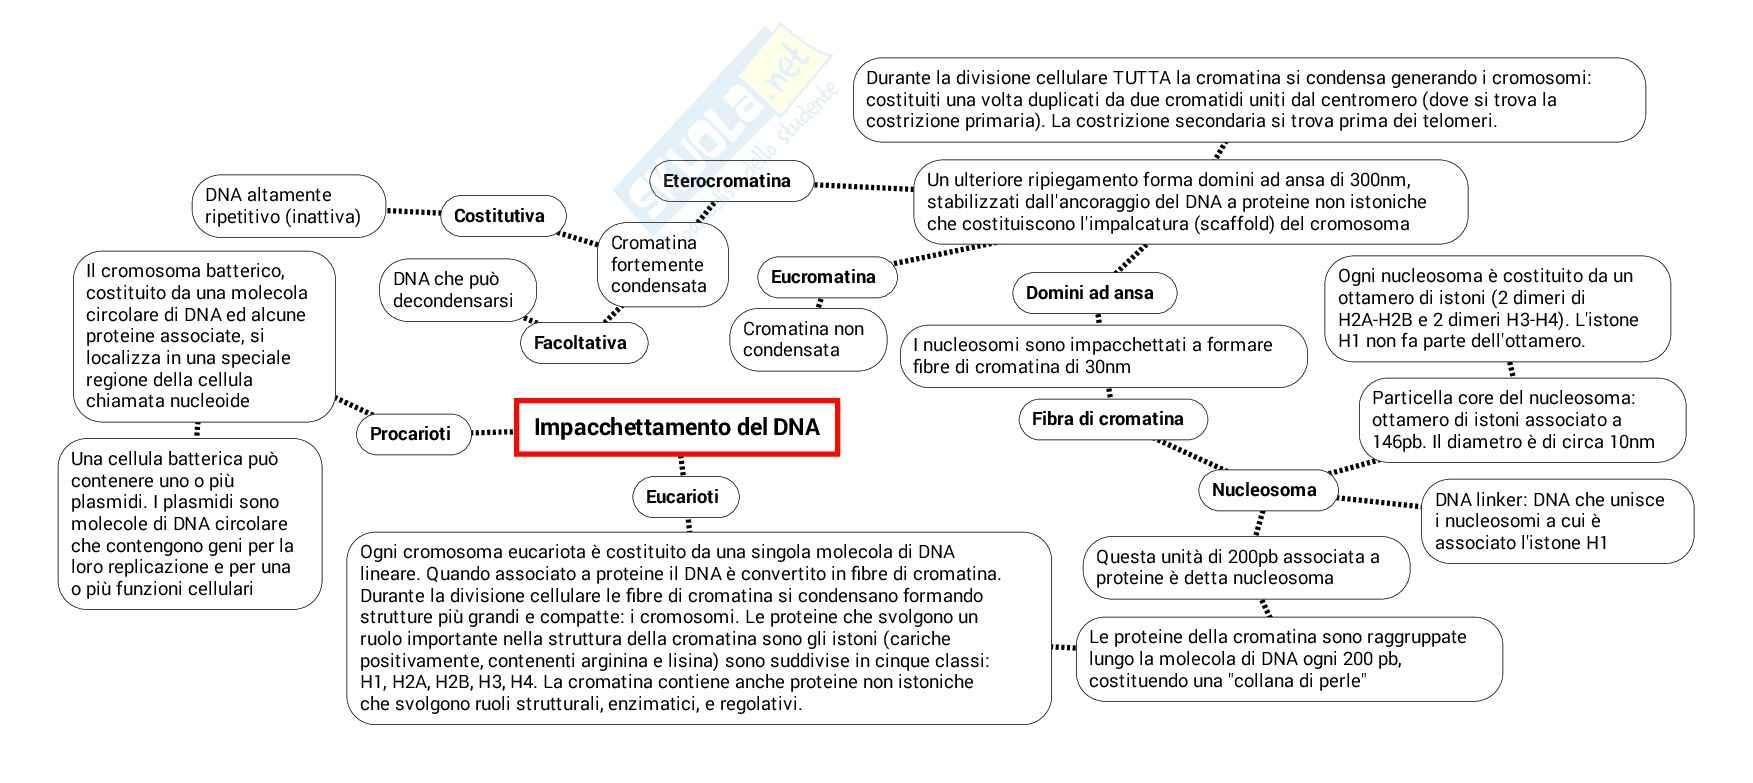 Schema su Dna cromosomi e nucleo pdf